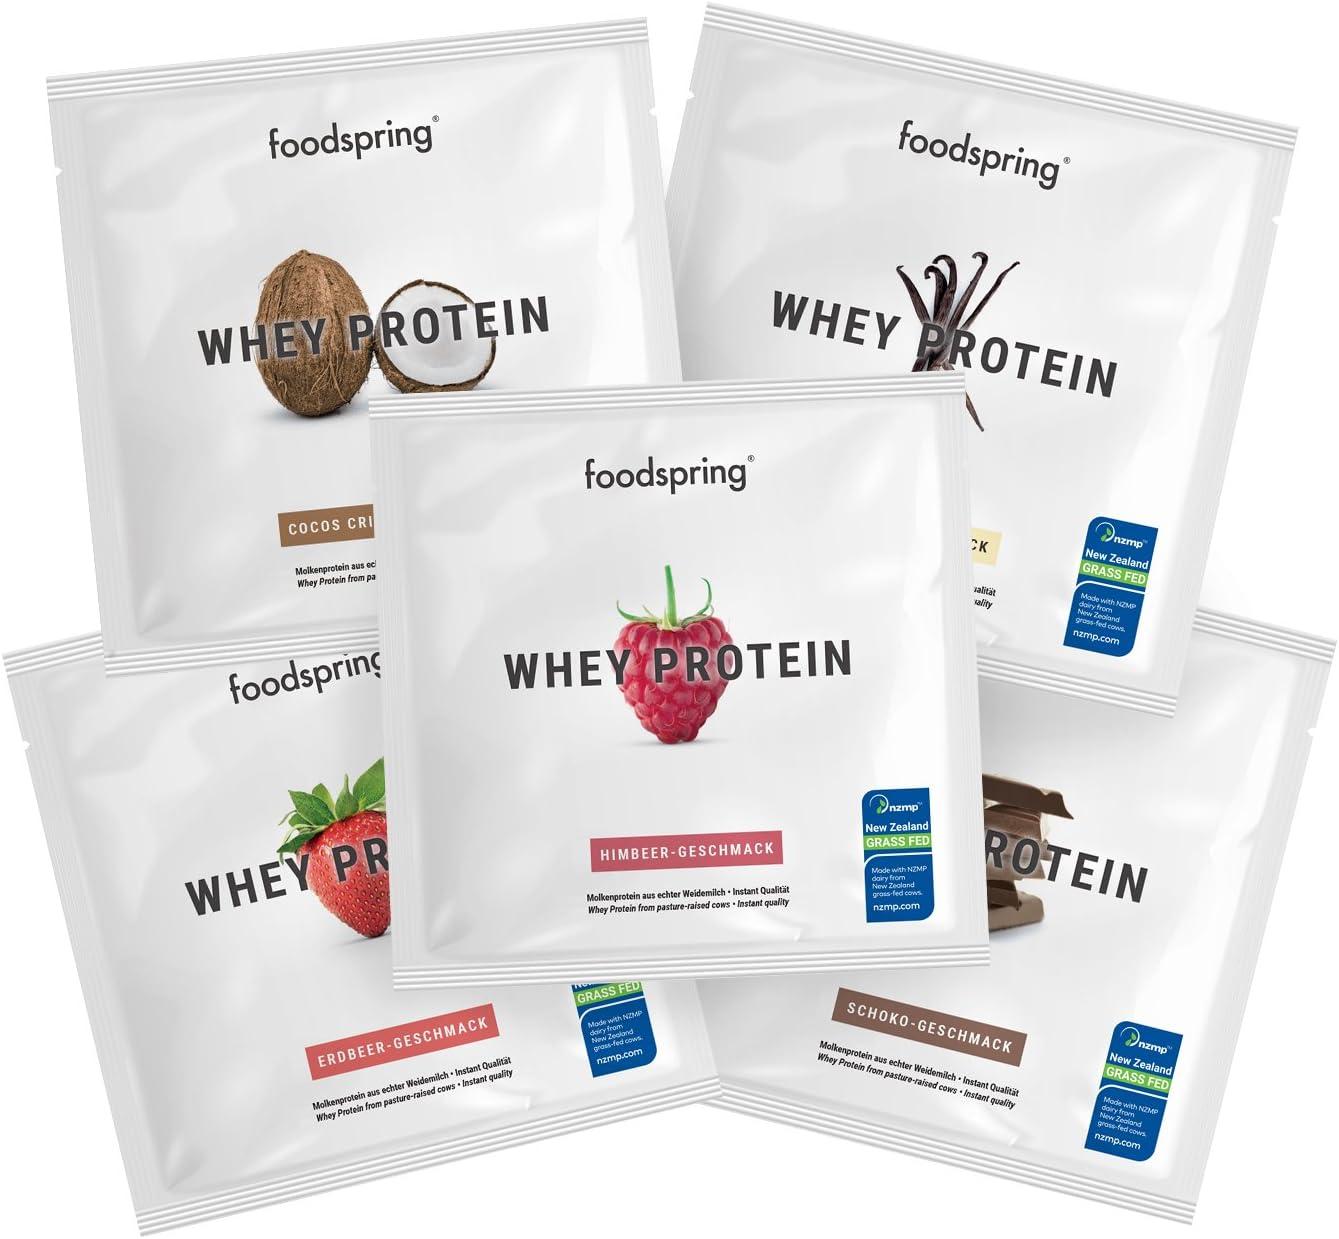 foodspring Proteína Whey para llevar en pack de 5, Proteína ...